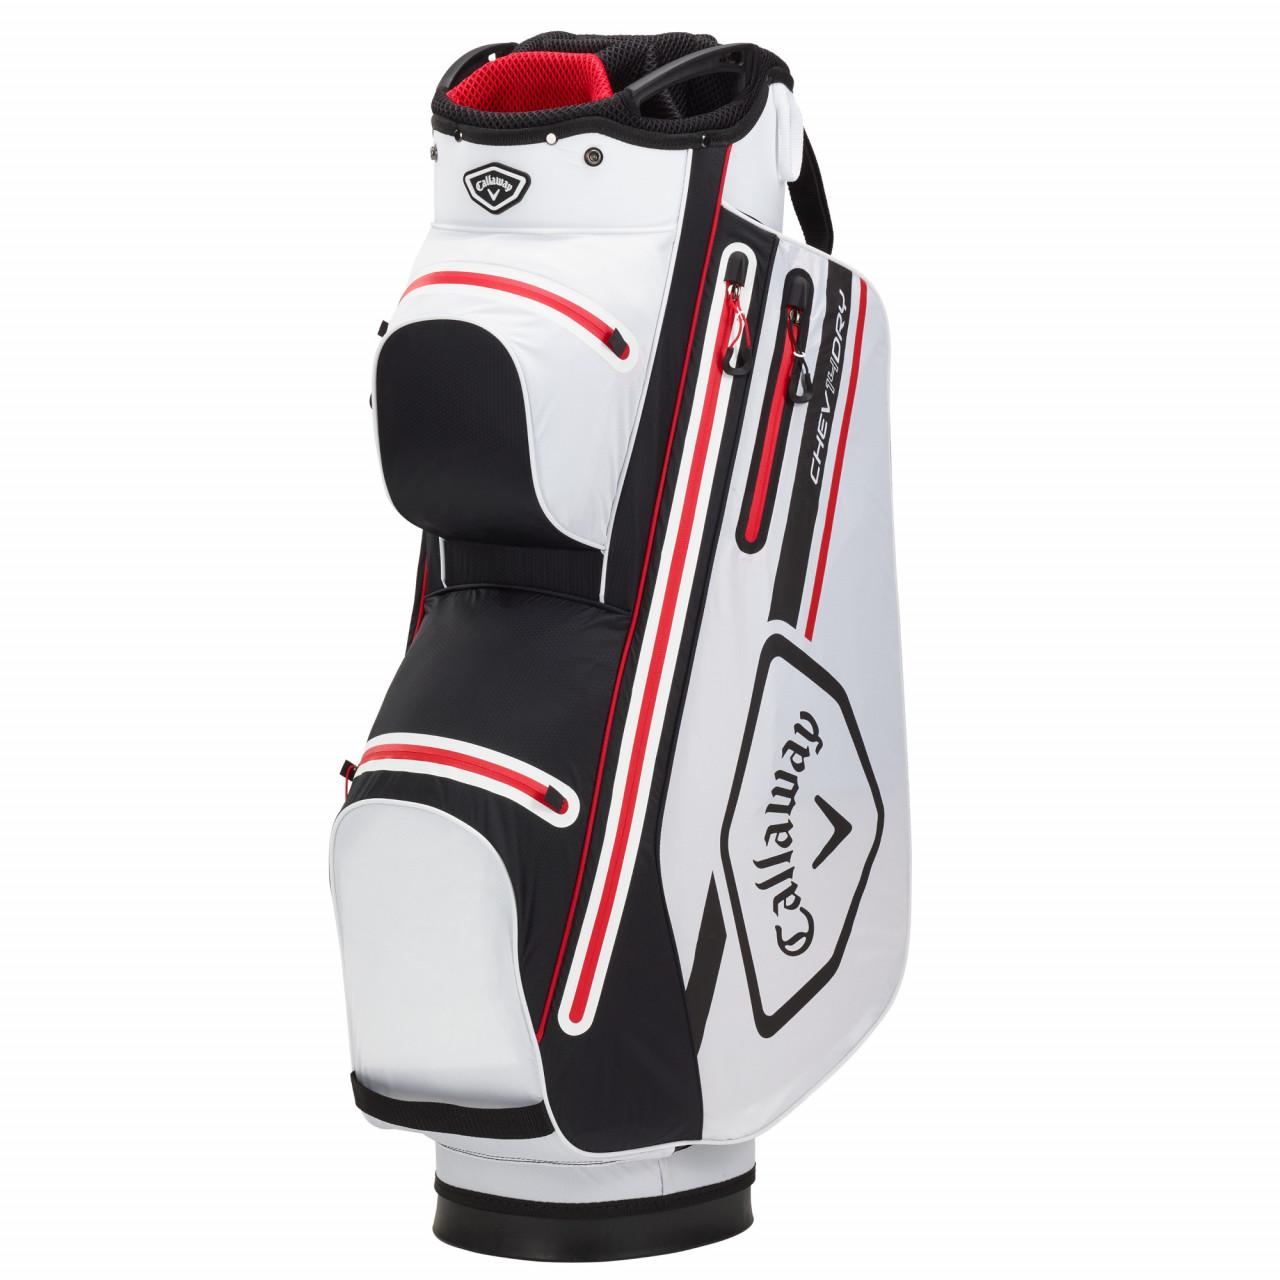 Golf Callaway 2021 Chev Dry 14 Waterproof Cartbag, Weiß / Schwarz / Rot